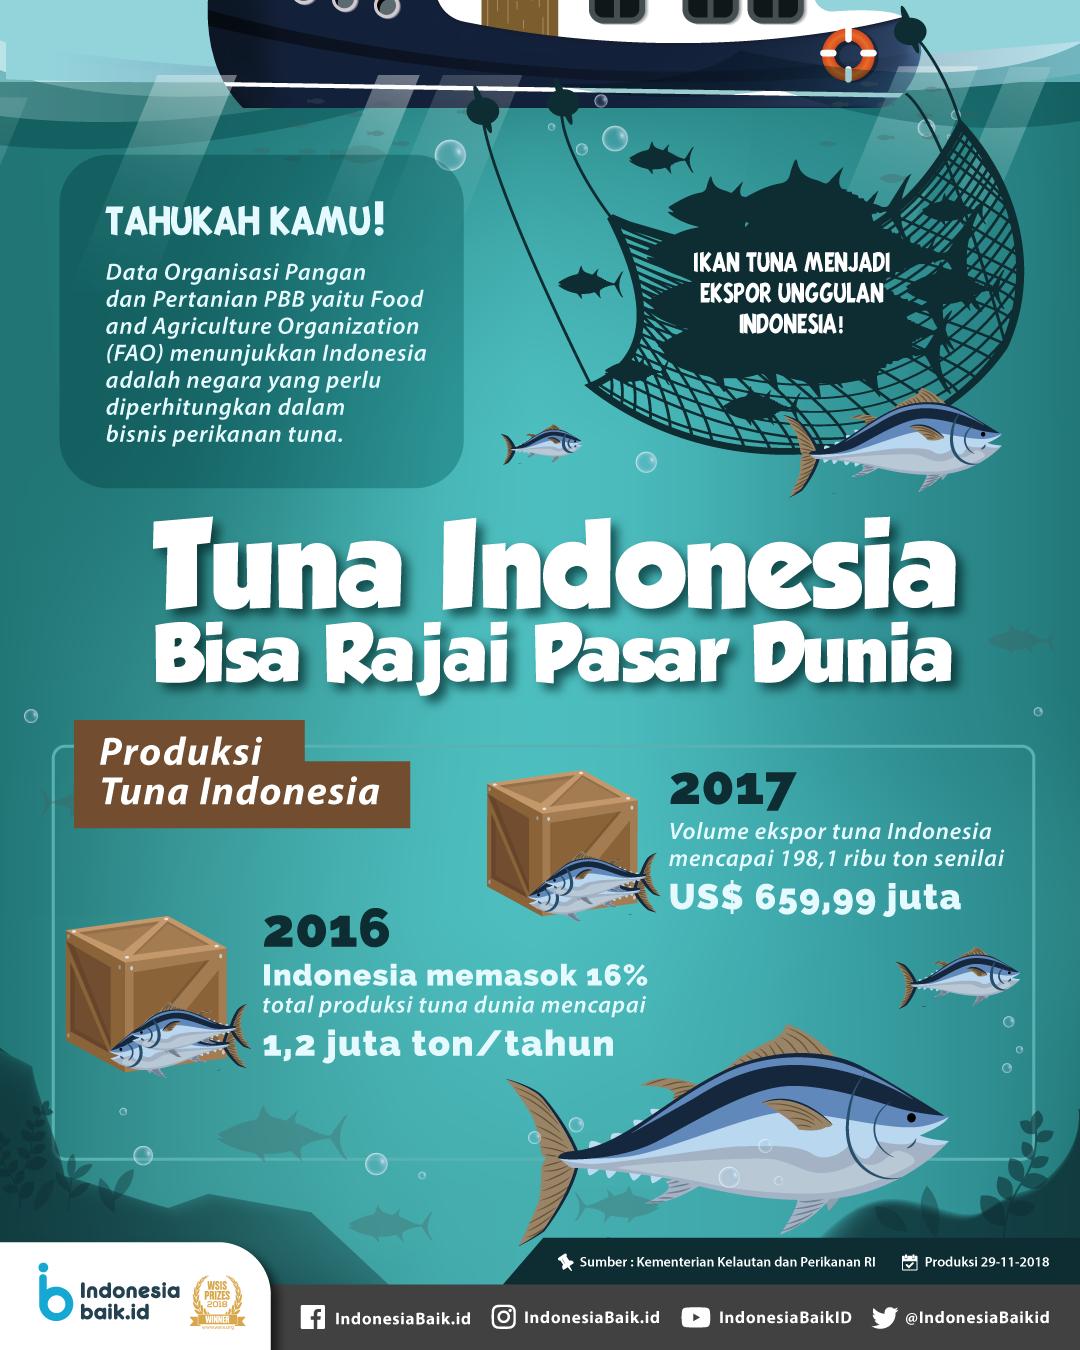 Tuna Indonesia Bisa Rajai Pasar Dunia